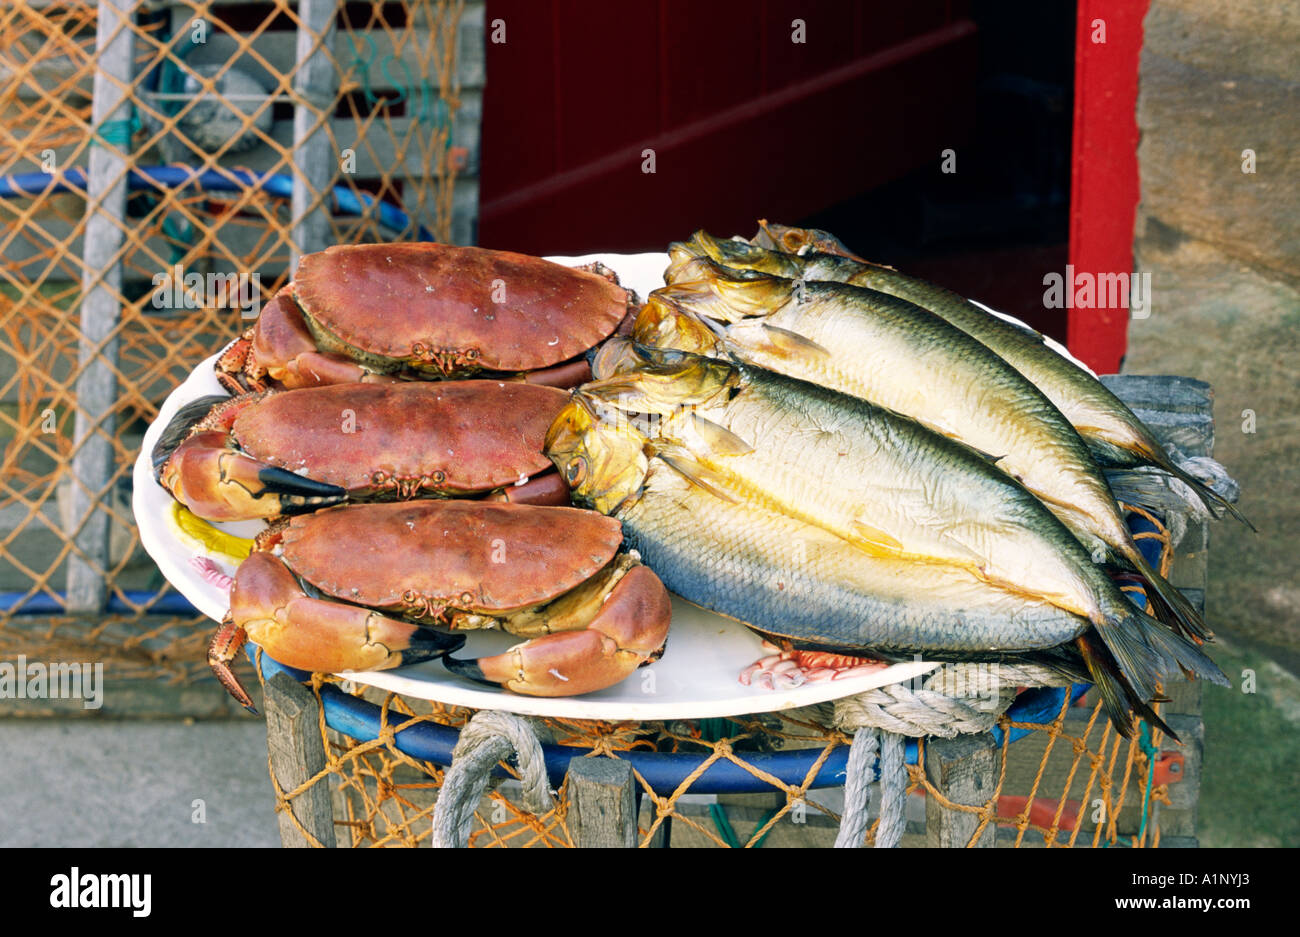 Fresh kippers and crab outside the Swallowfish smokehouse shop at Seahouses, Northumberland. - Stock Image